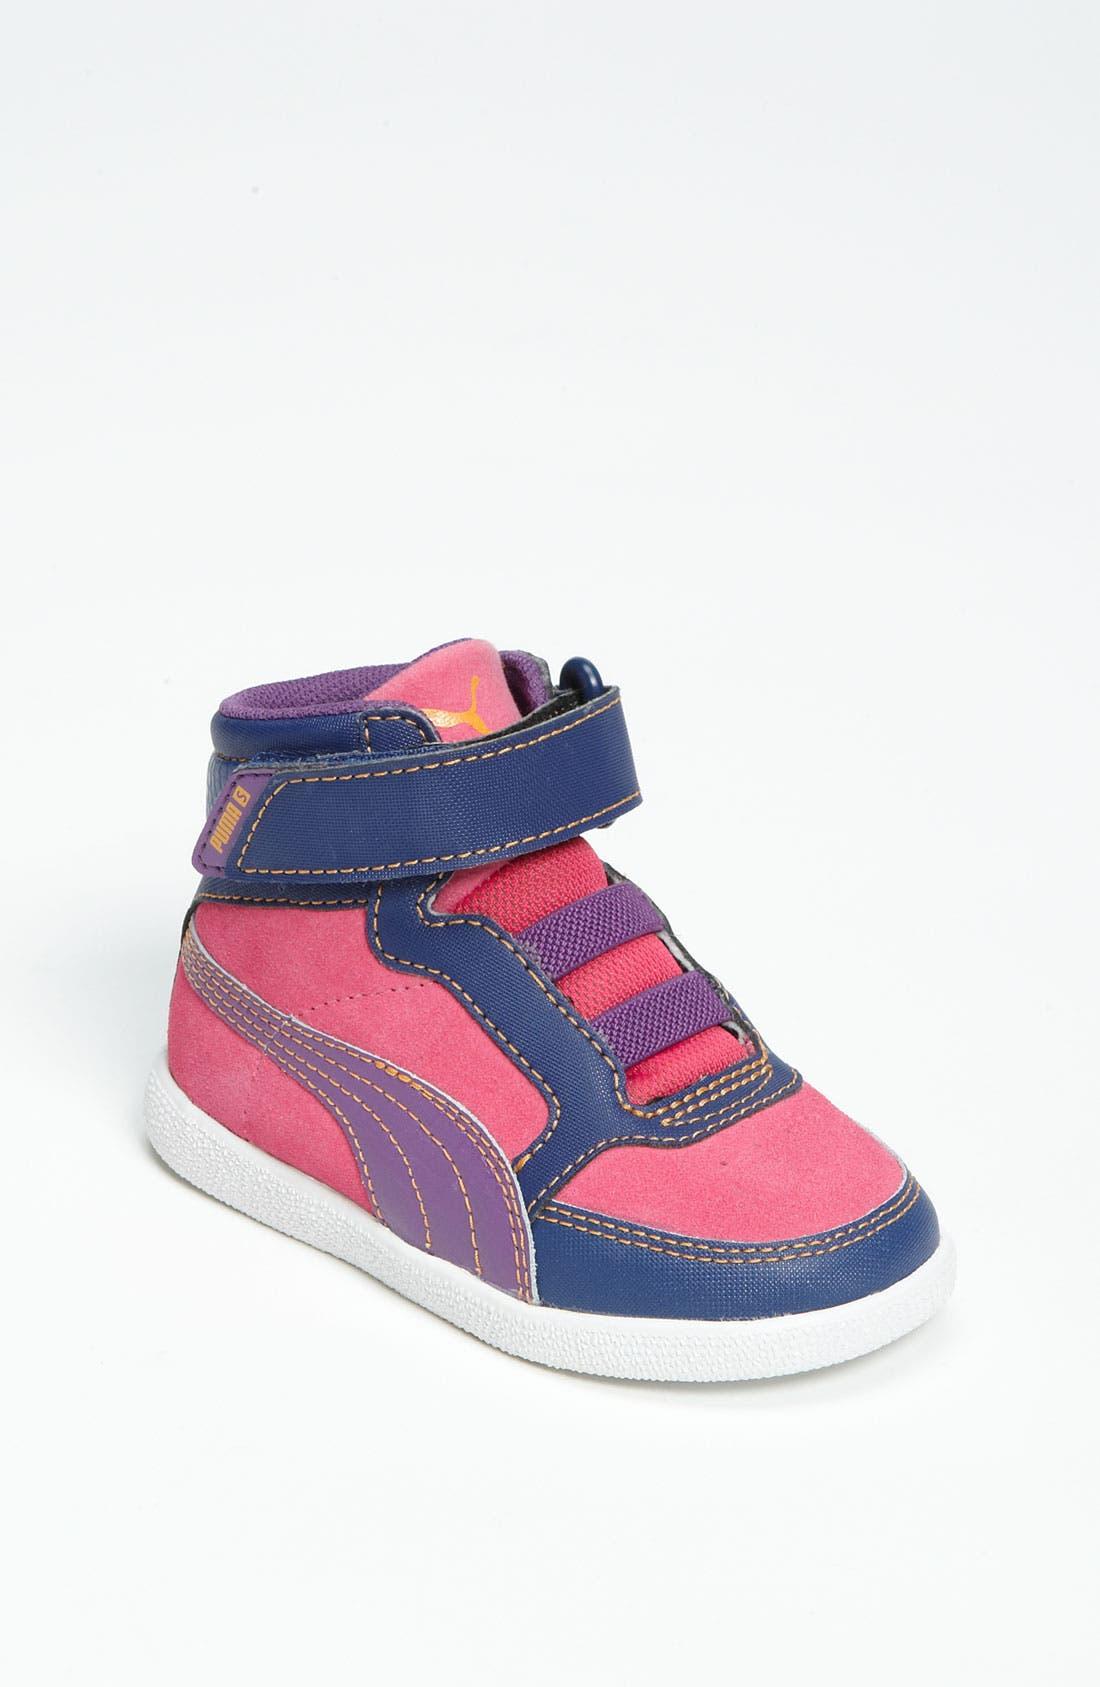 Alternate Image 1 Selected - PUMA 'Skylaa' Sneaker (Toddler, Little Kid & Big Kid)